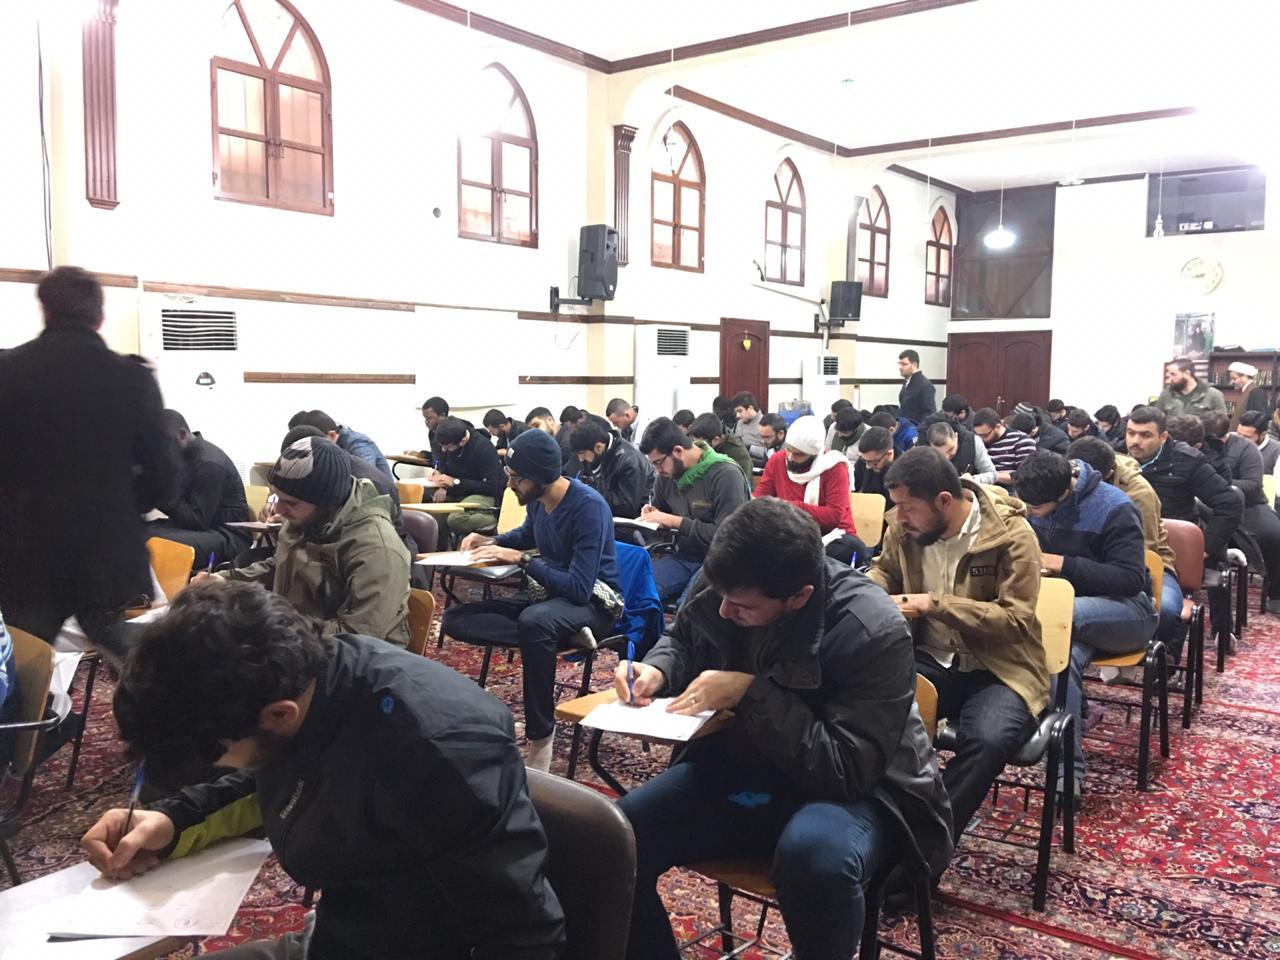 امتحانات پایان ترم در جامعة المصطفی العالمیه شاخه لبنان